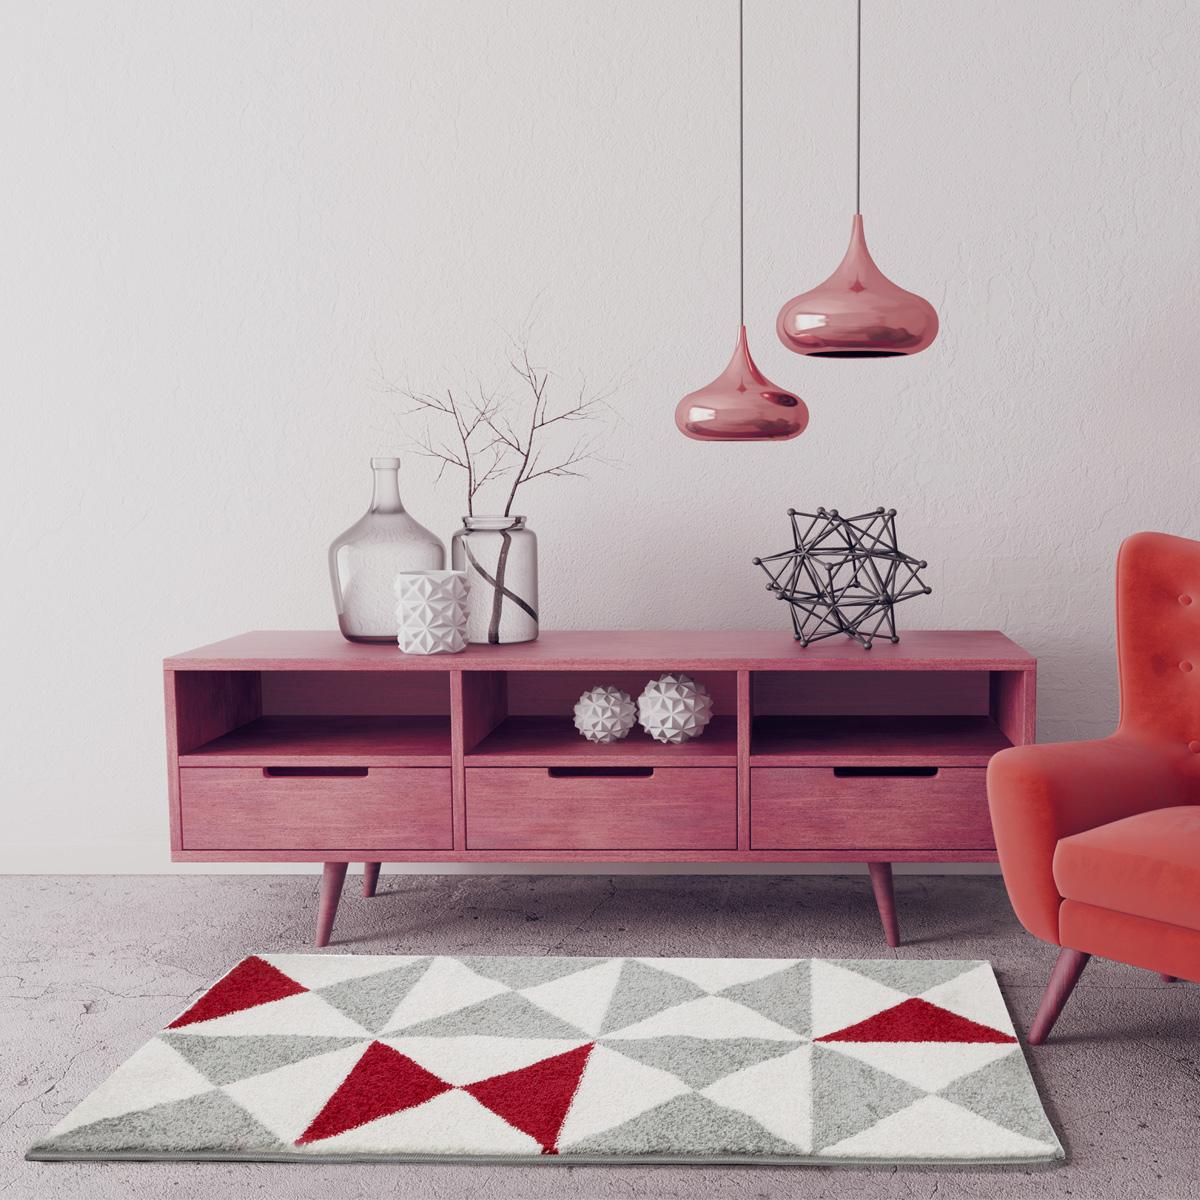 Tapis à triangles tricolores - Rouge - 200 x 280 cm